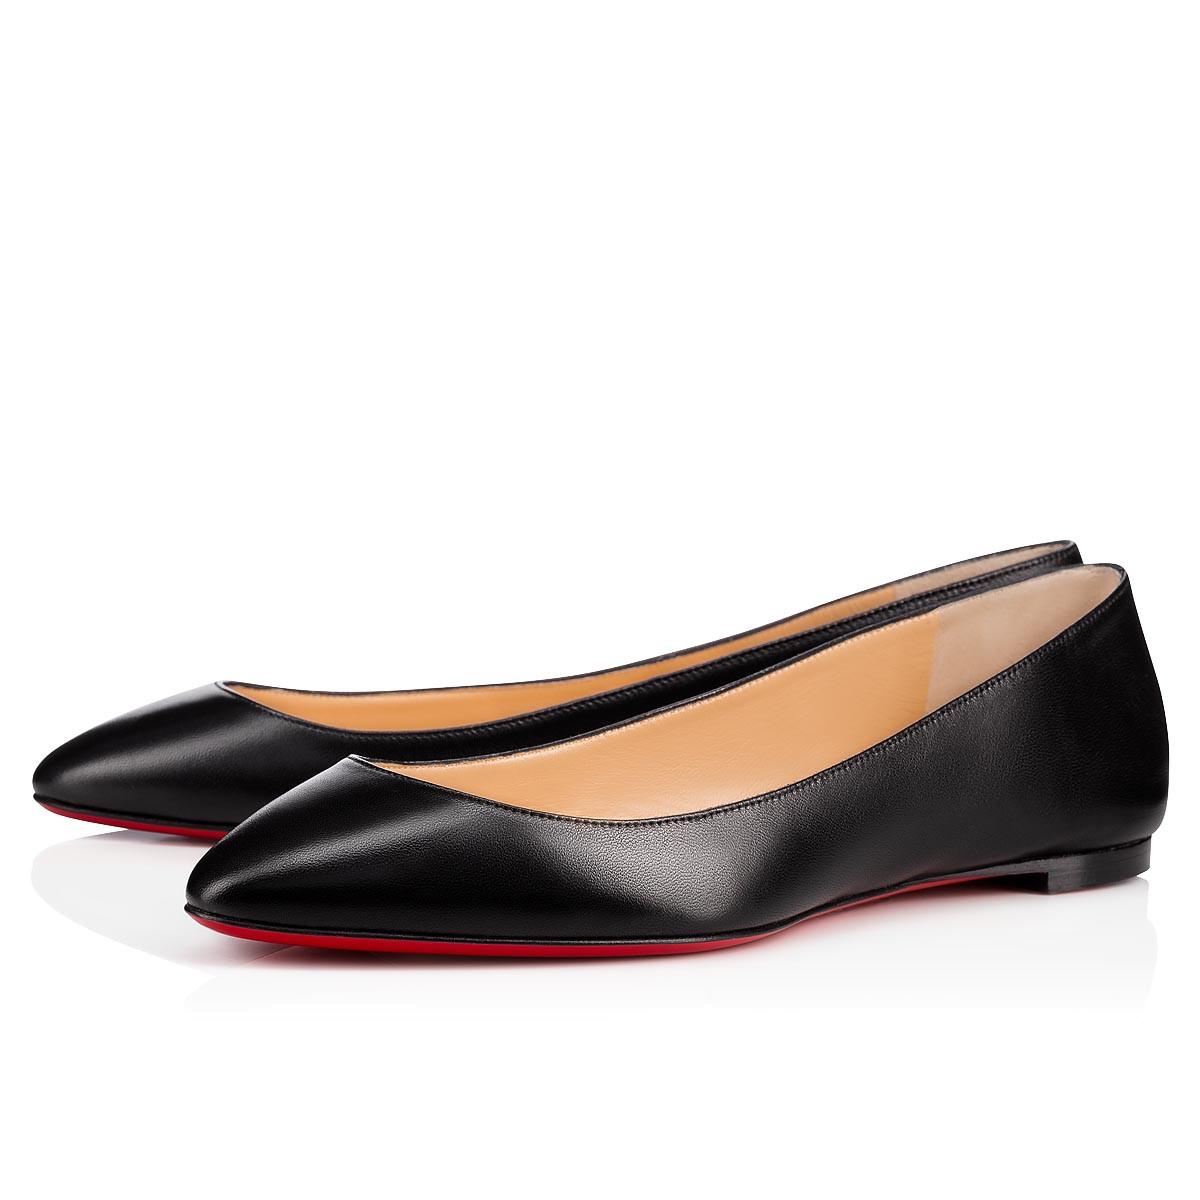 Shoes - Eloise Flat - Christian Louboutin